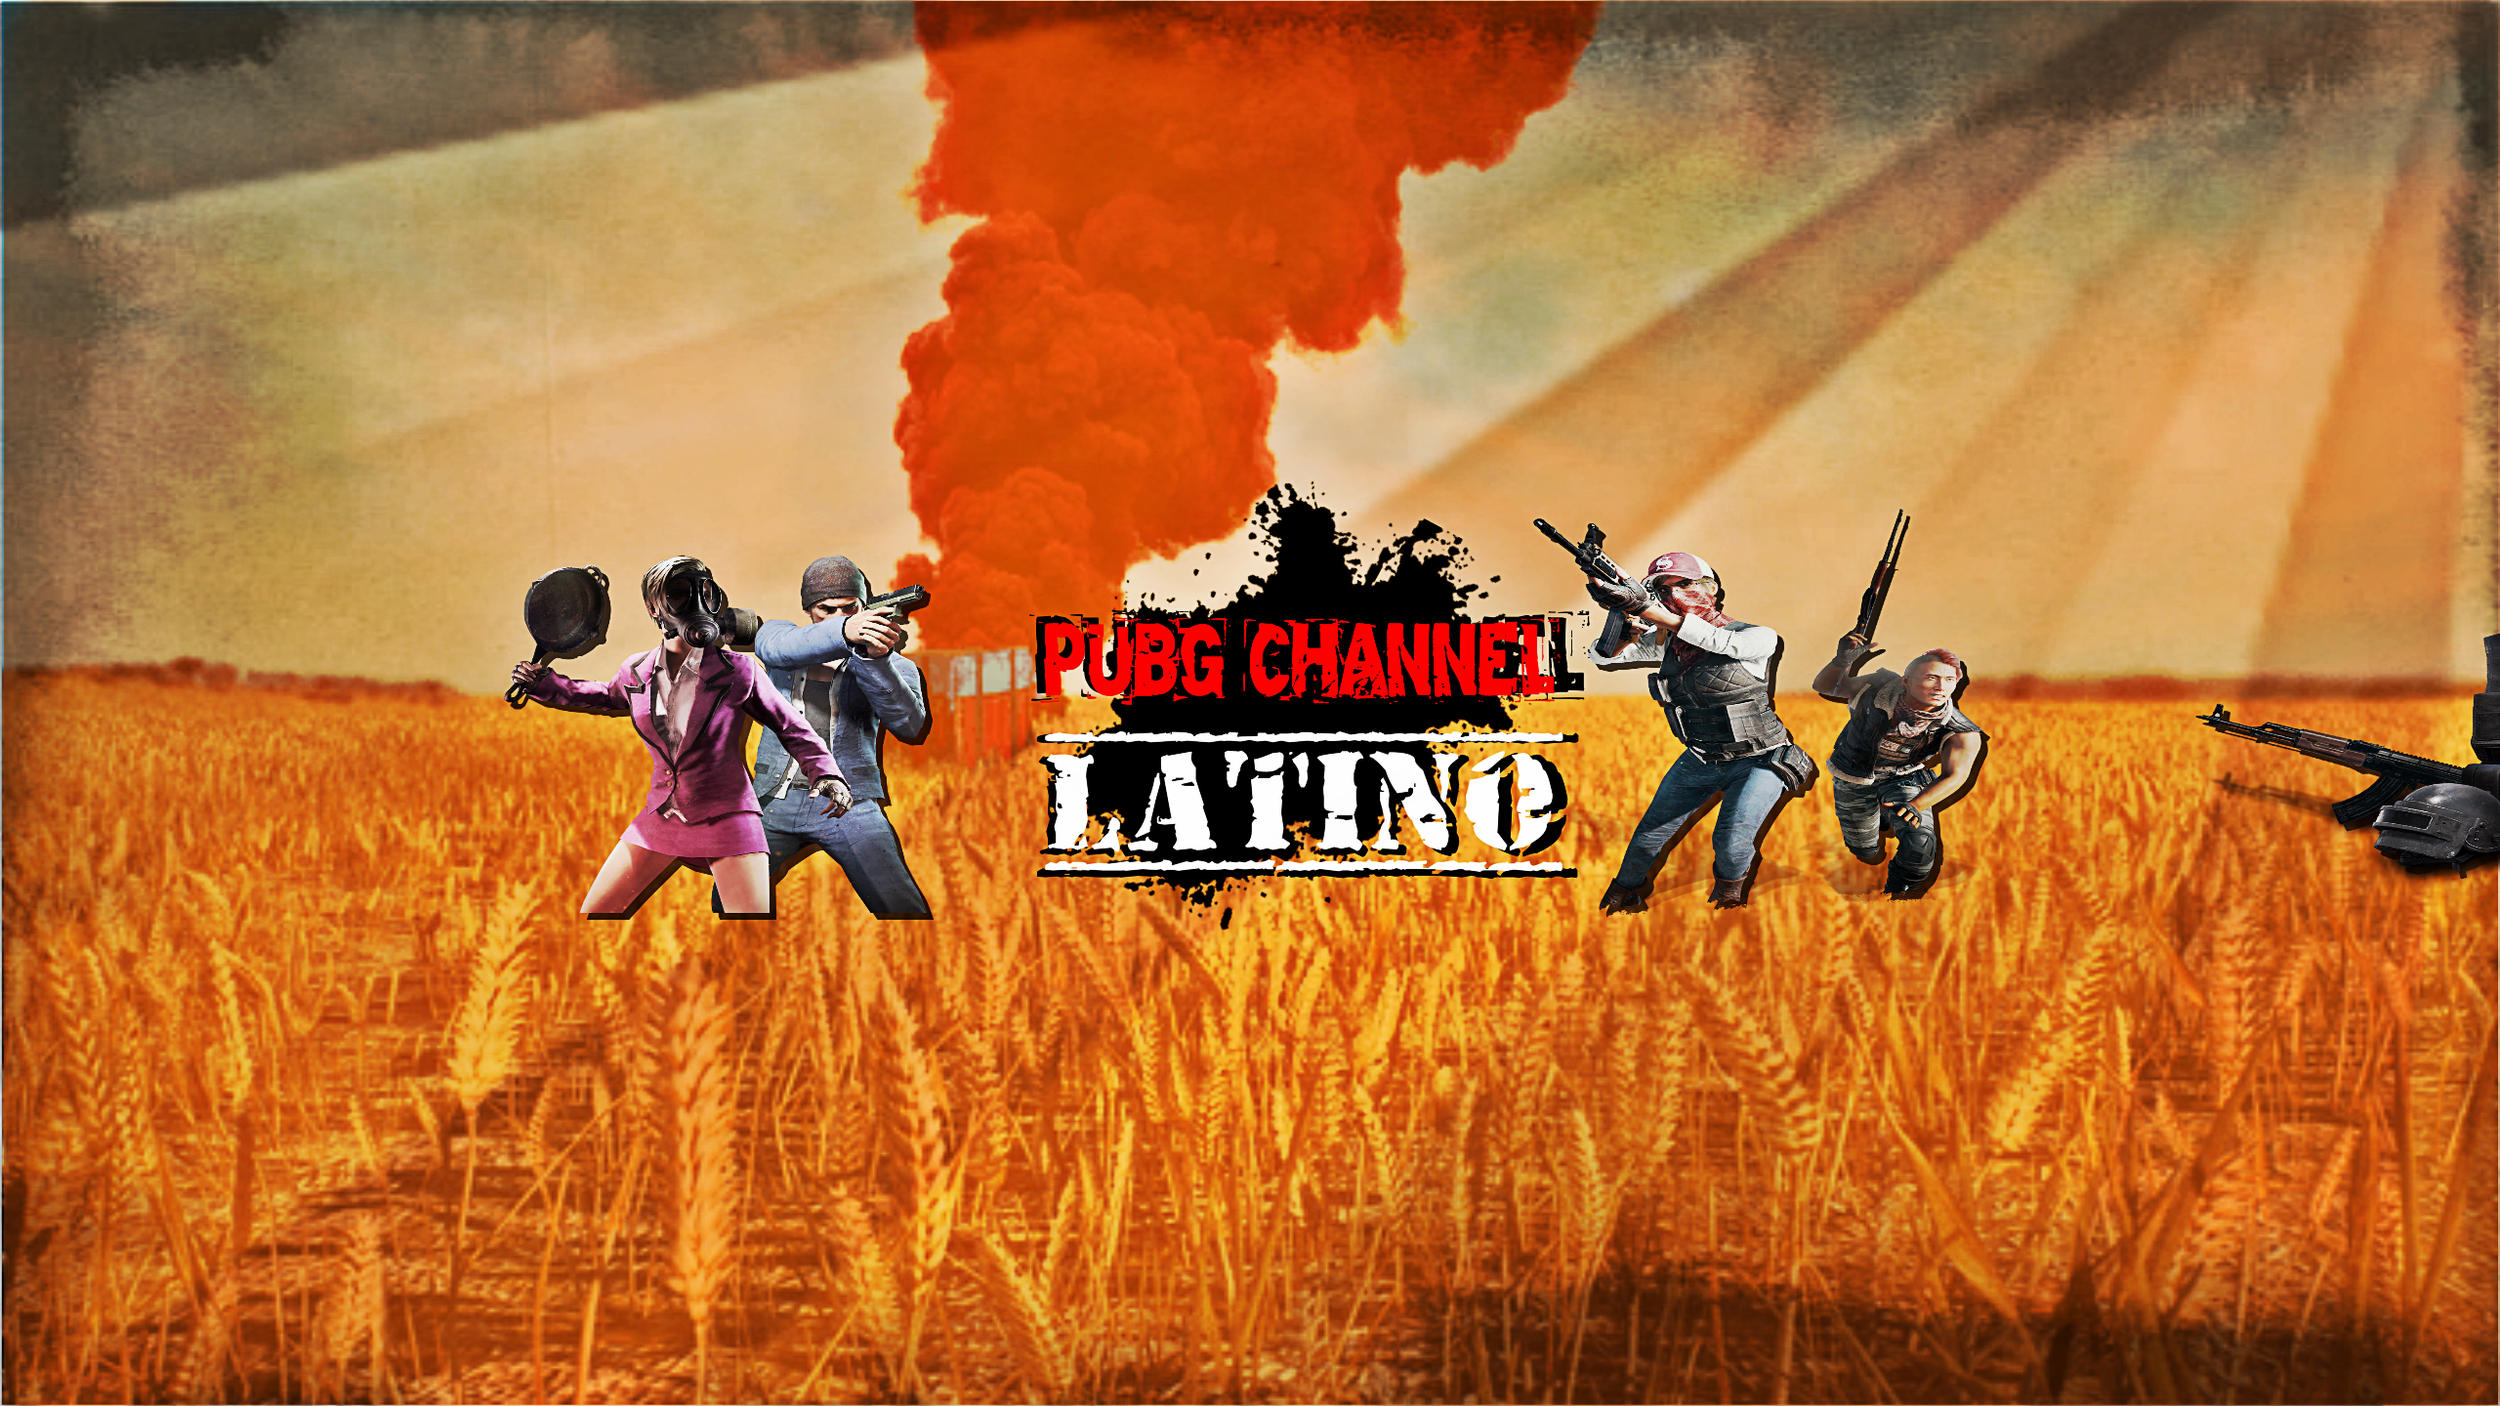 Pubg Channel Latino- Serie de Playerunknown's Battlegrounds